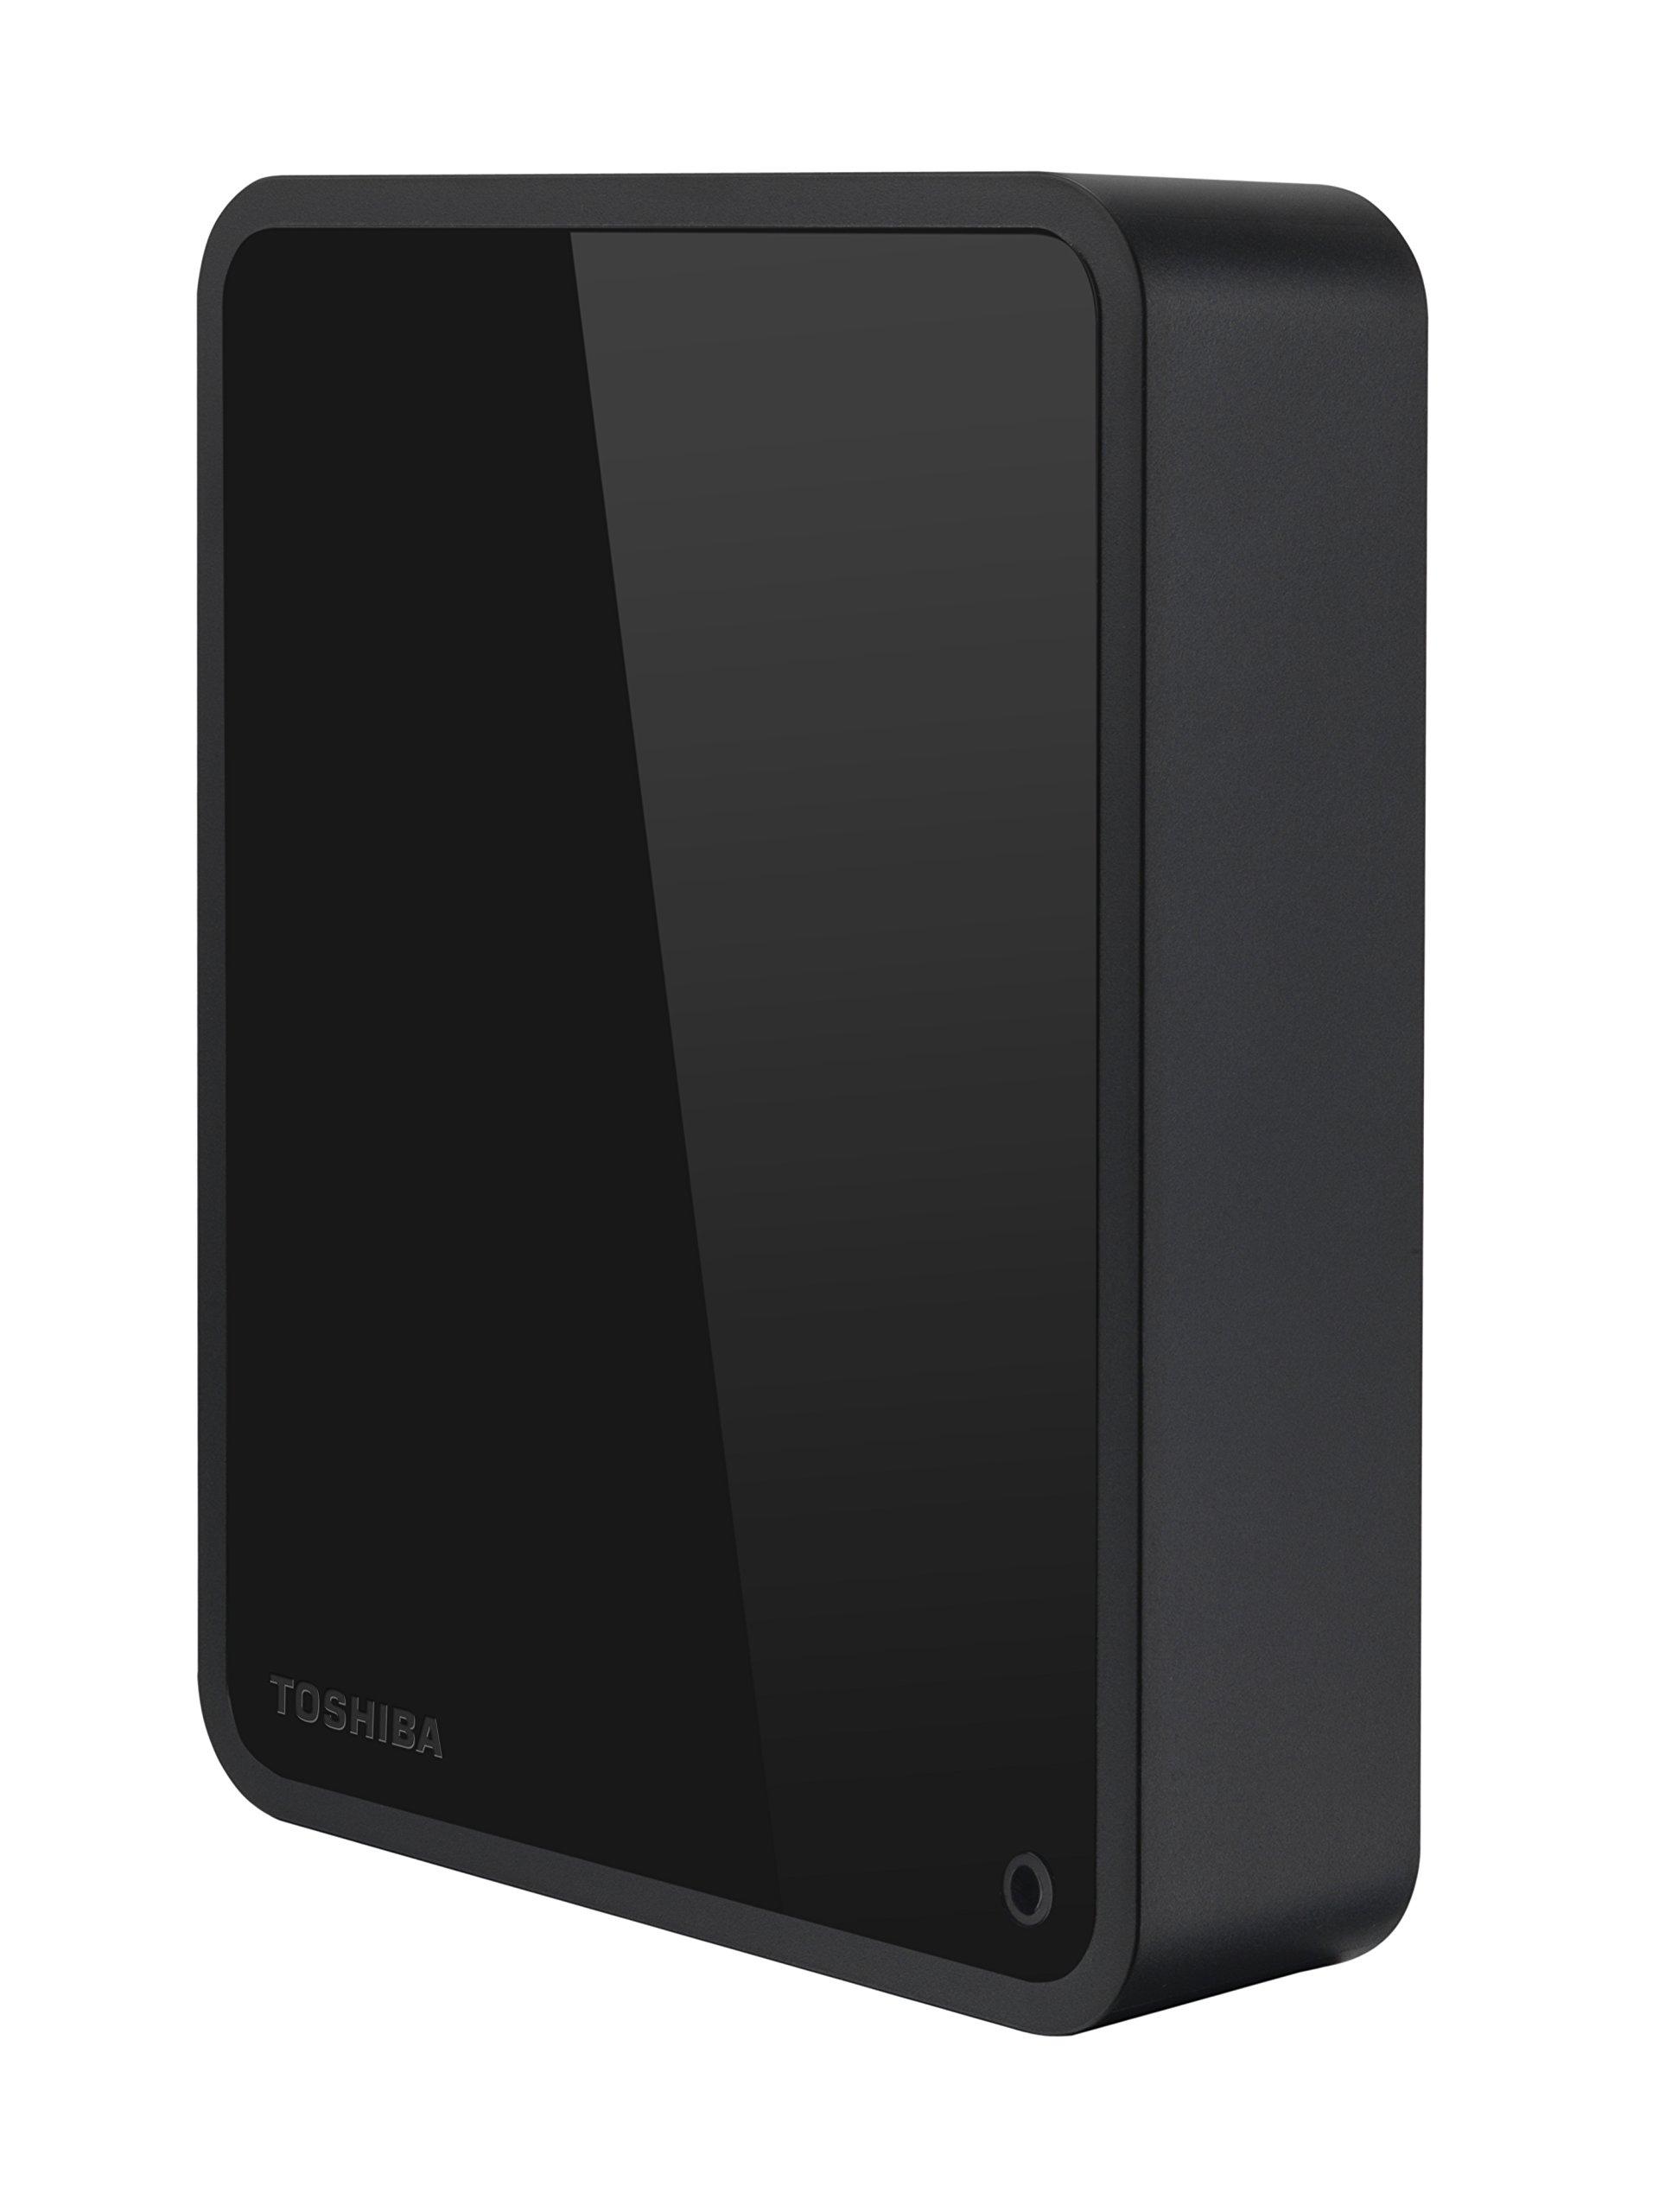 Toshiba 6TB Canvio for Desktop 7200 RPM External Hard Drive, USB 3.0 (HDWC360XK3JA)